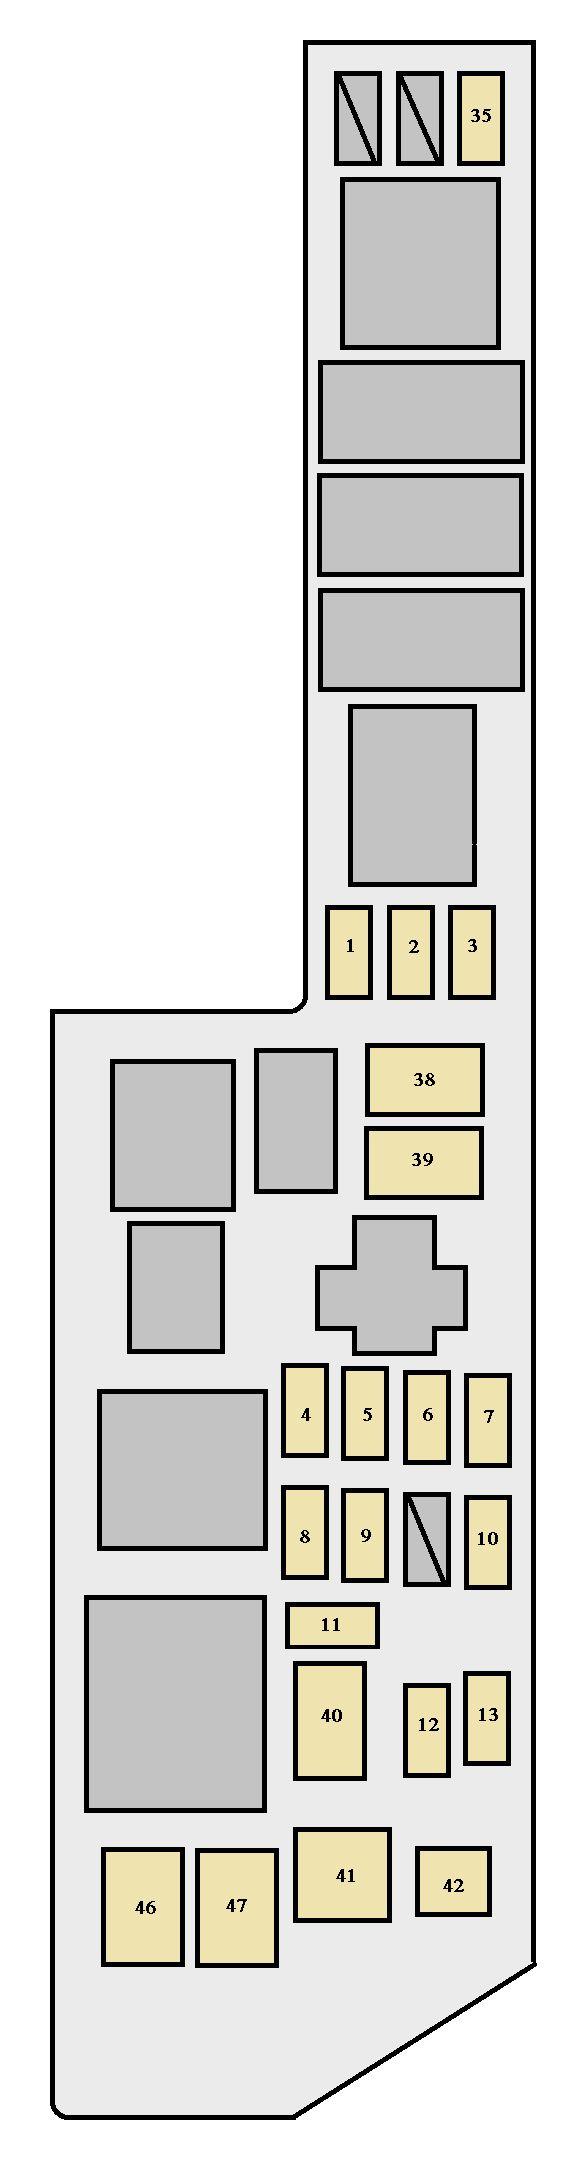 2001 toyota sienna fuse box diagram